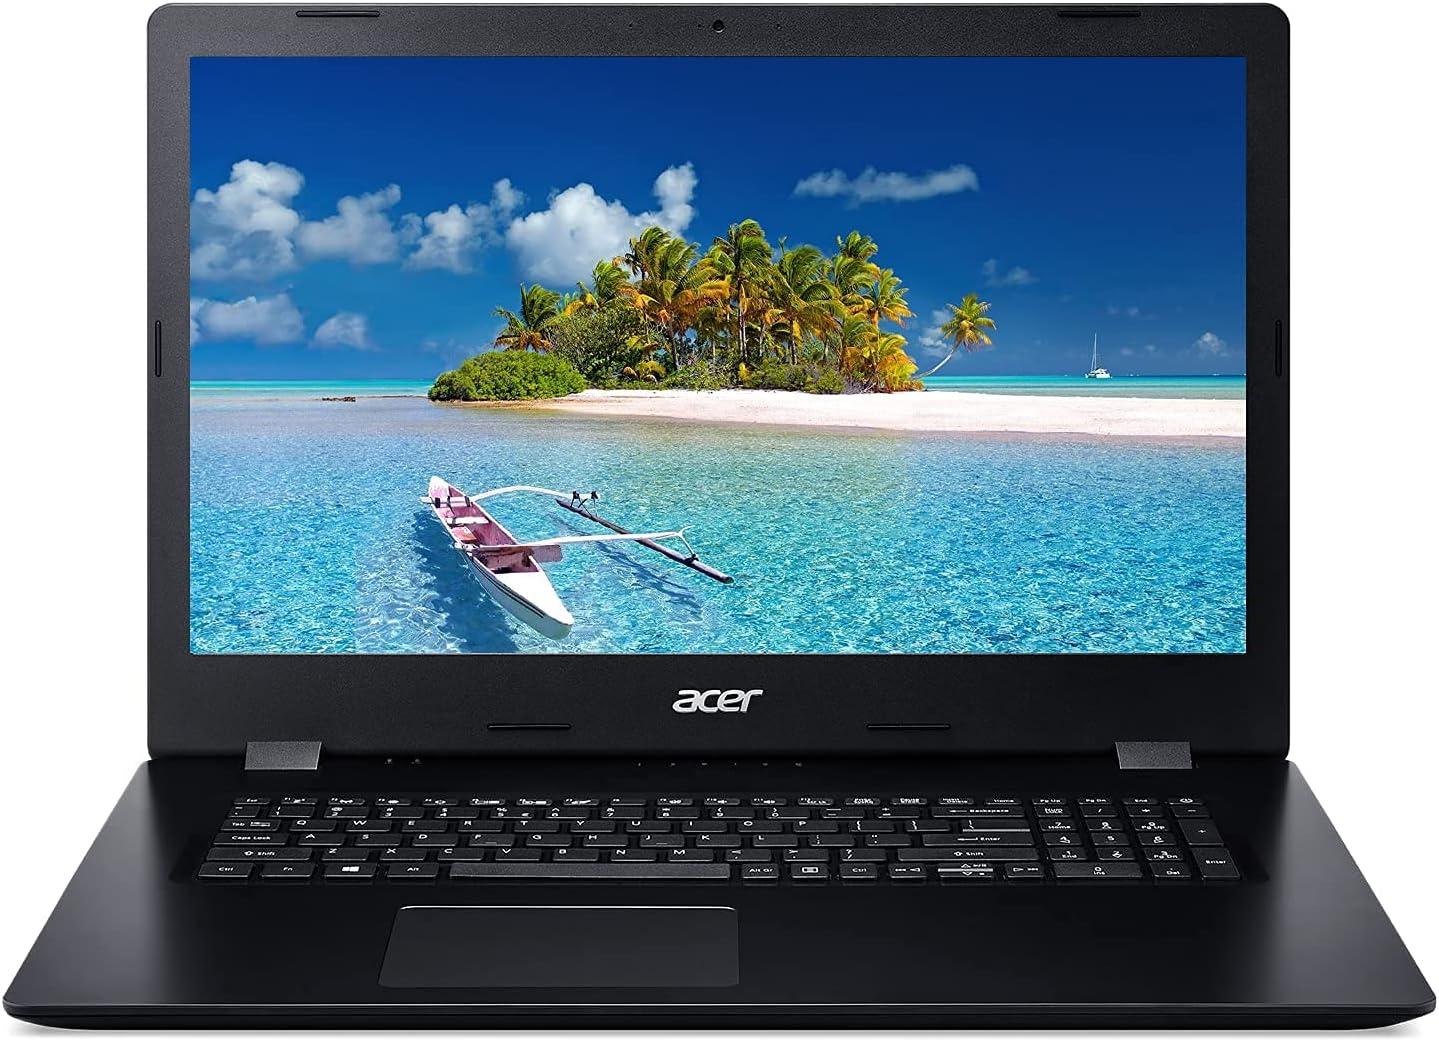 Acer Aspire Laptop, 17.3